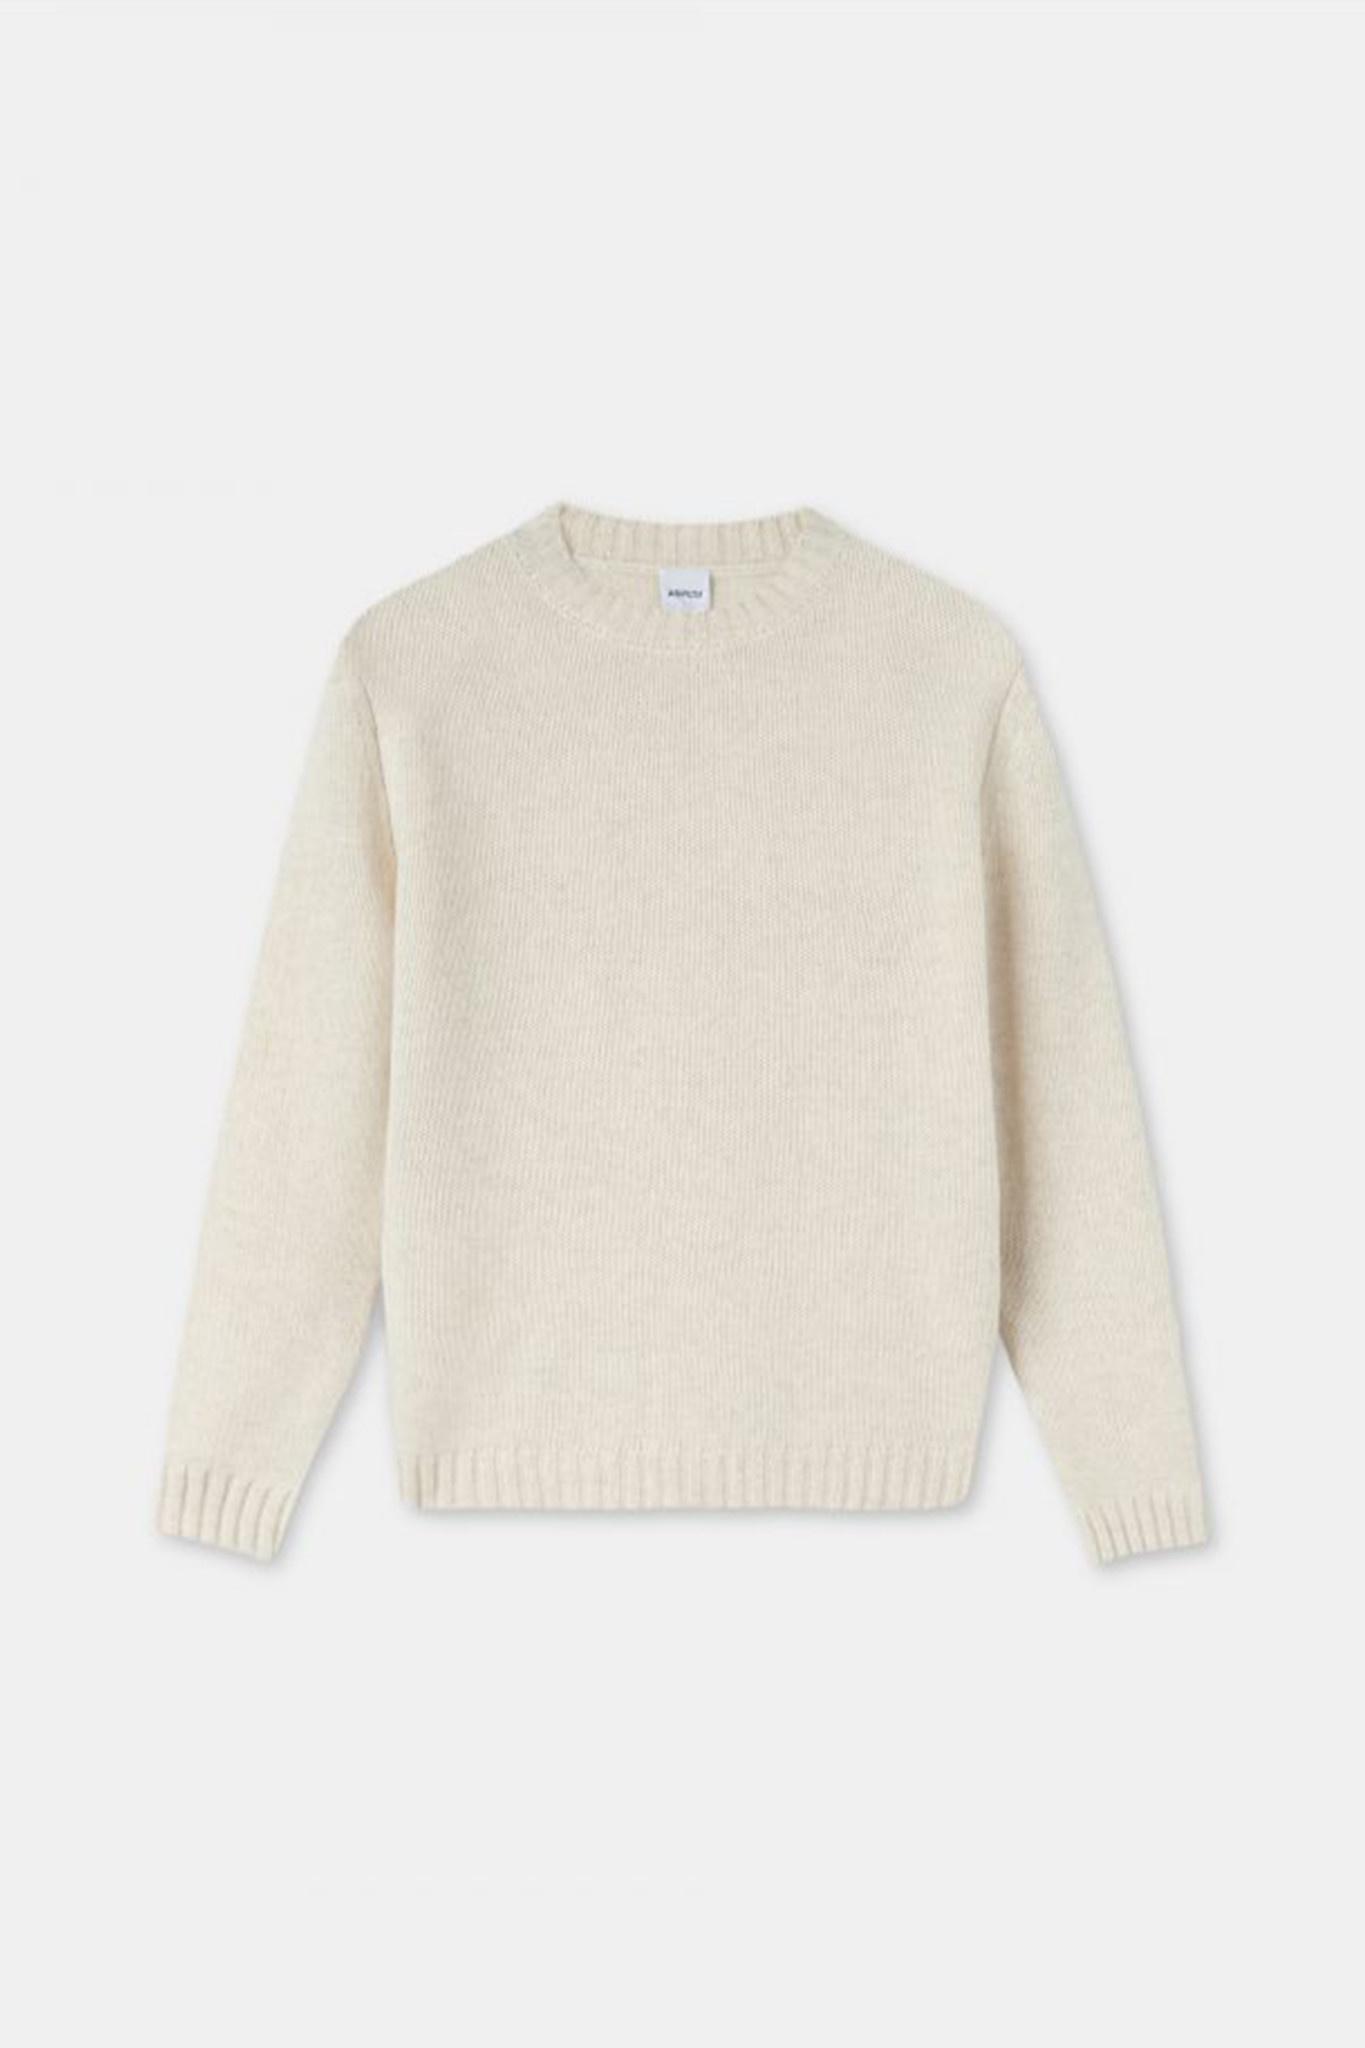 Cashmere Crewneck Sweater - Cream-1